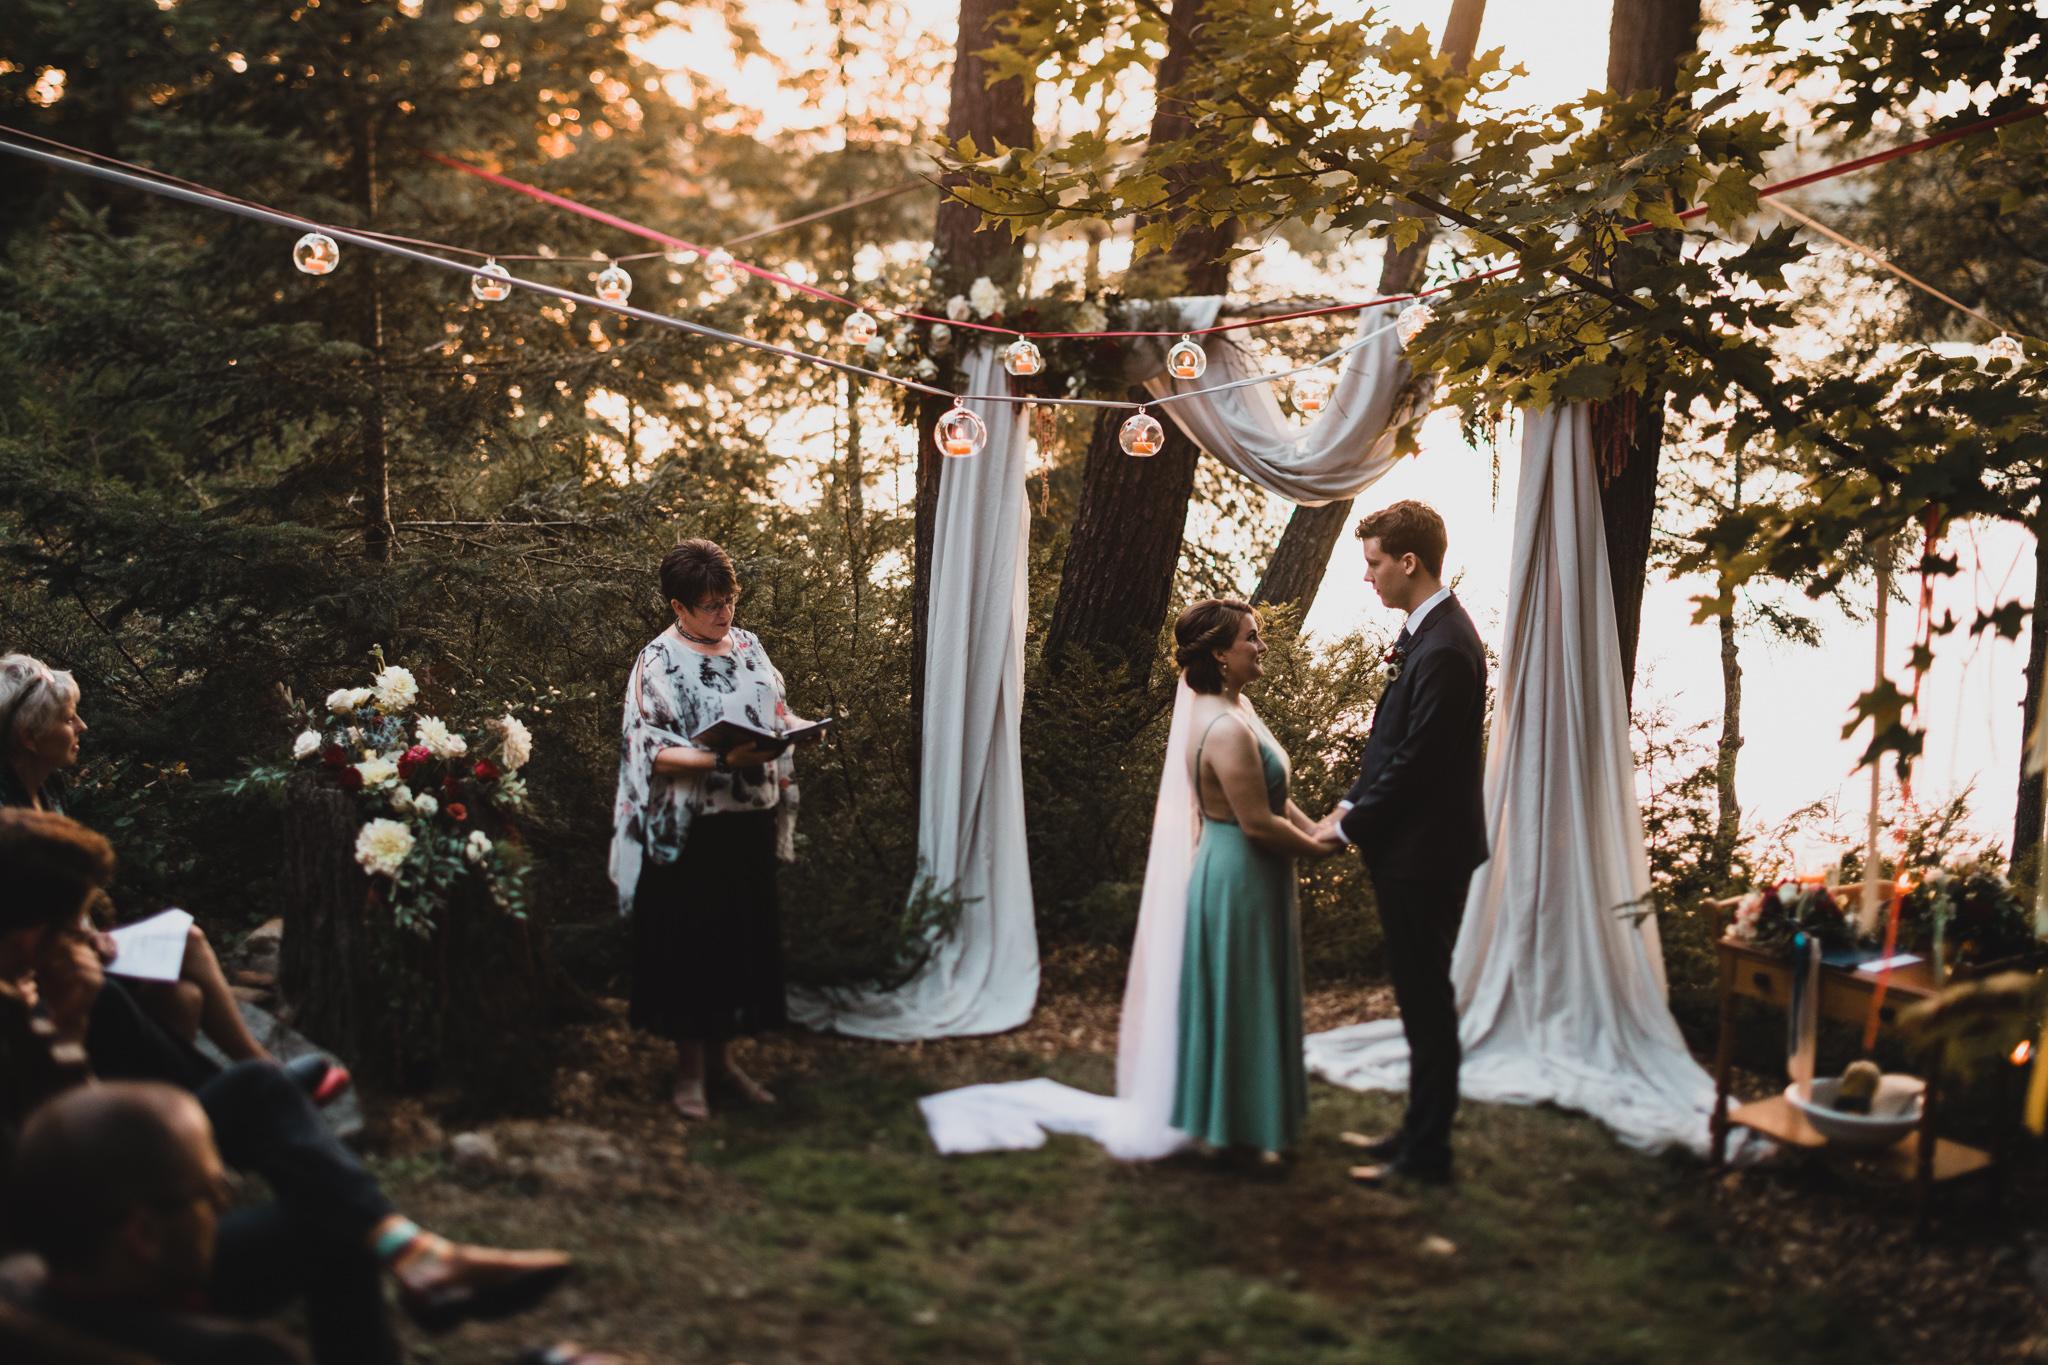 014-WEB-Jonathan-Kuhn-Photography-Taylor-Noah-Wedding-Preview-1452.jpg